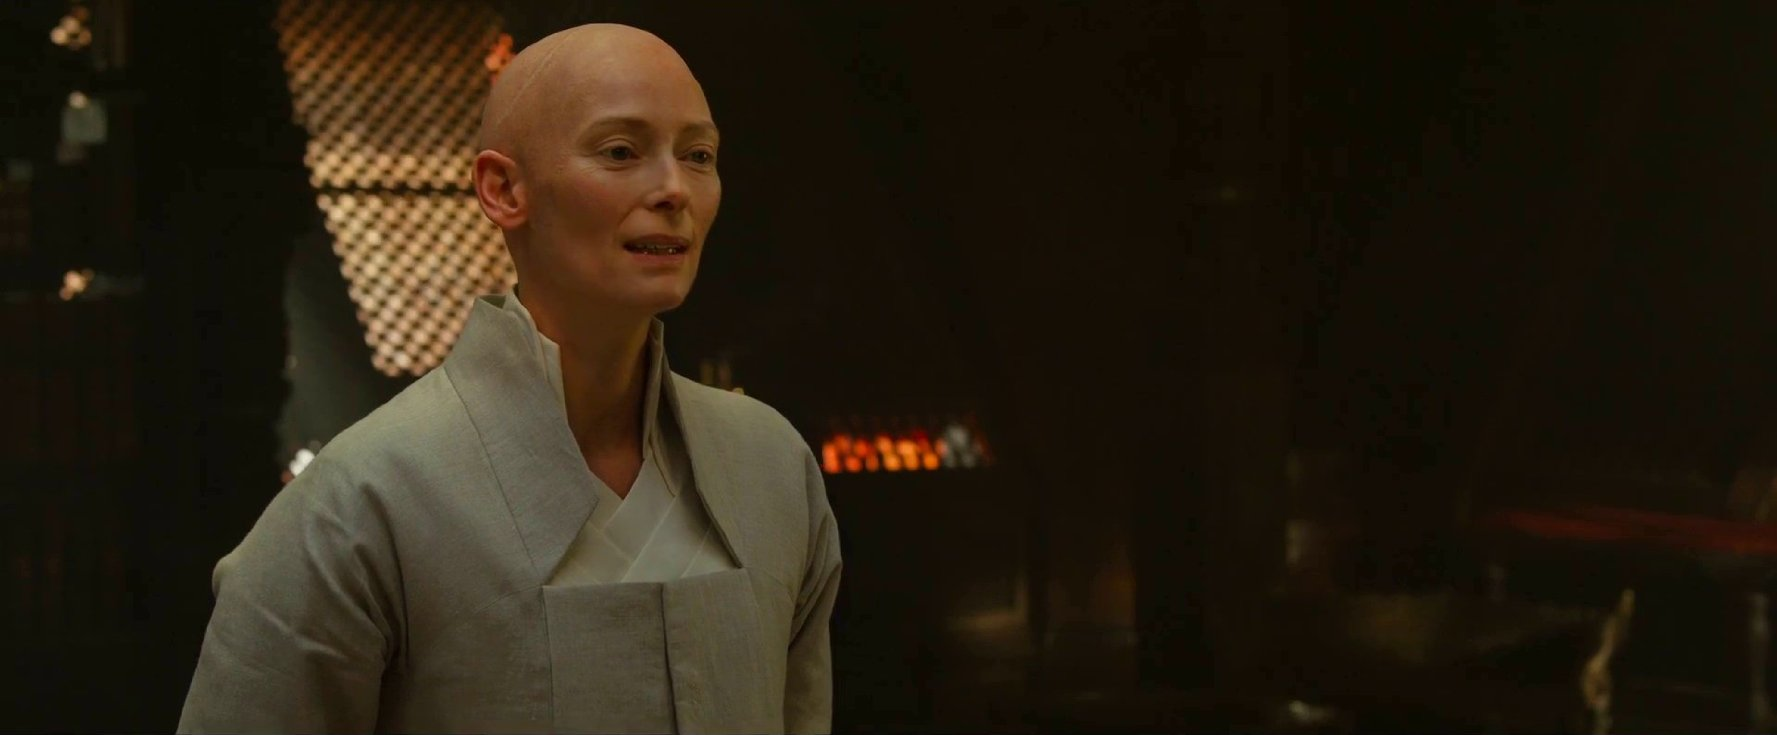 Tilda Swinton in Doctor Strange.